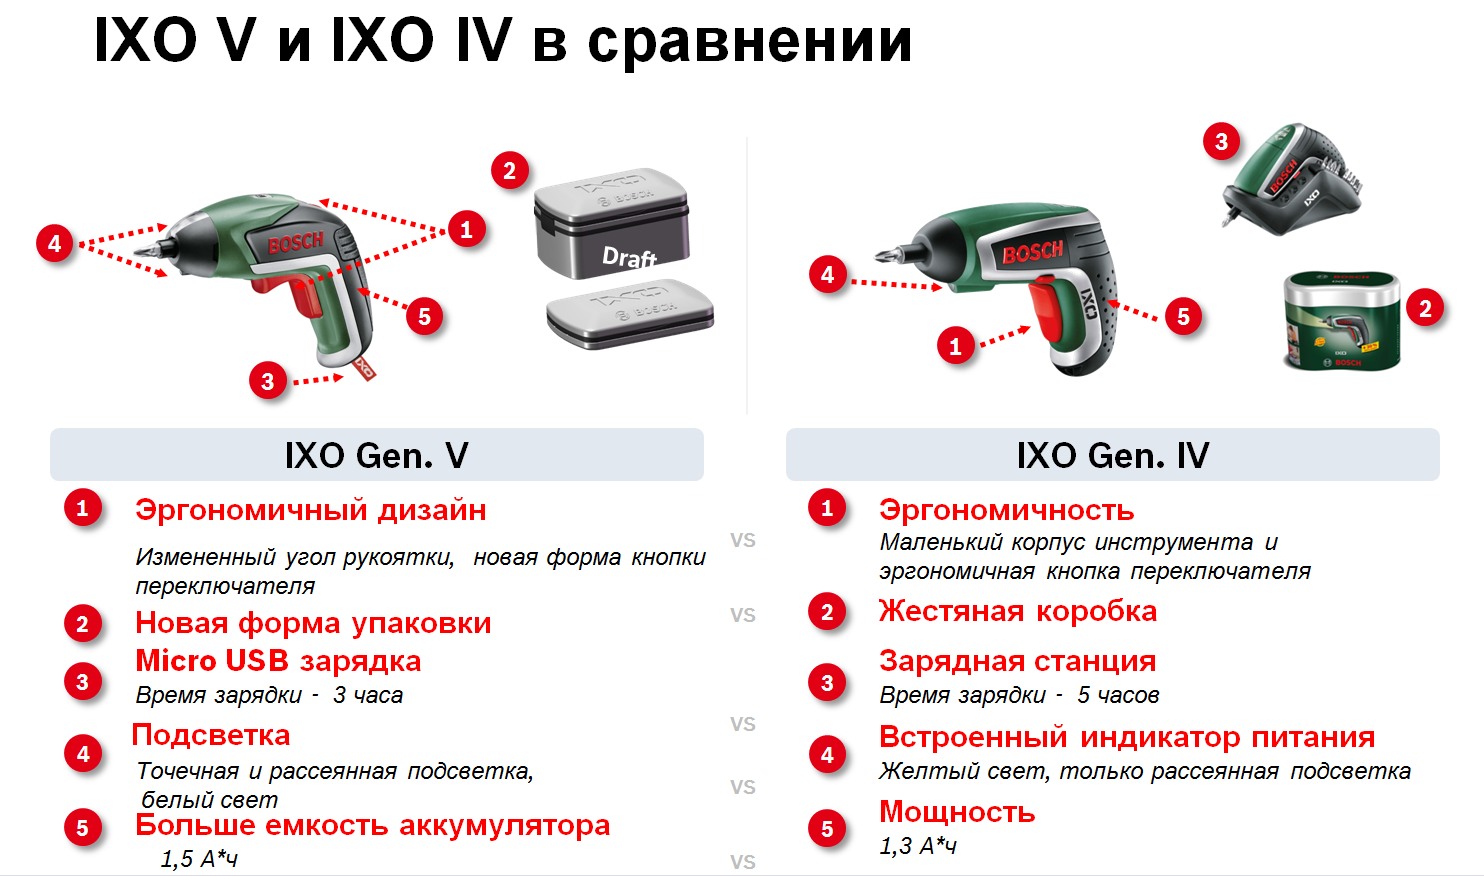 Сравнение IXO 5 и IXO 4